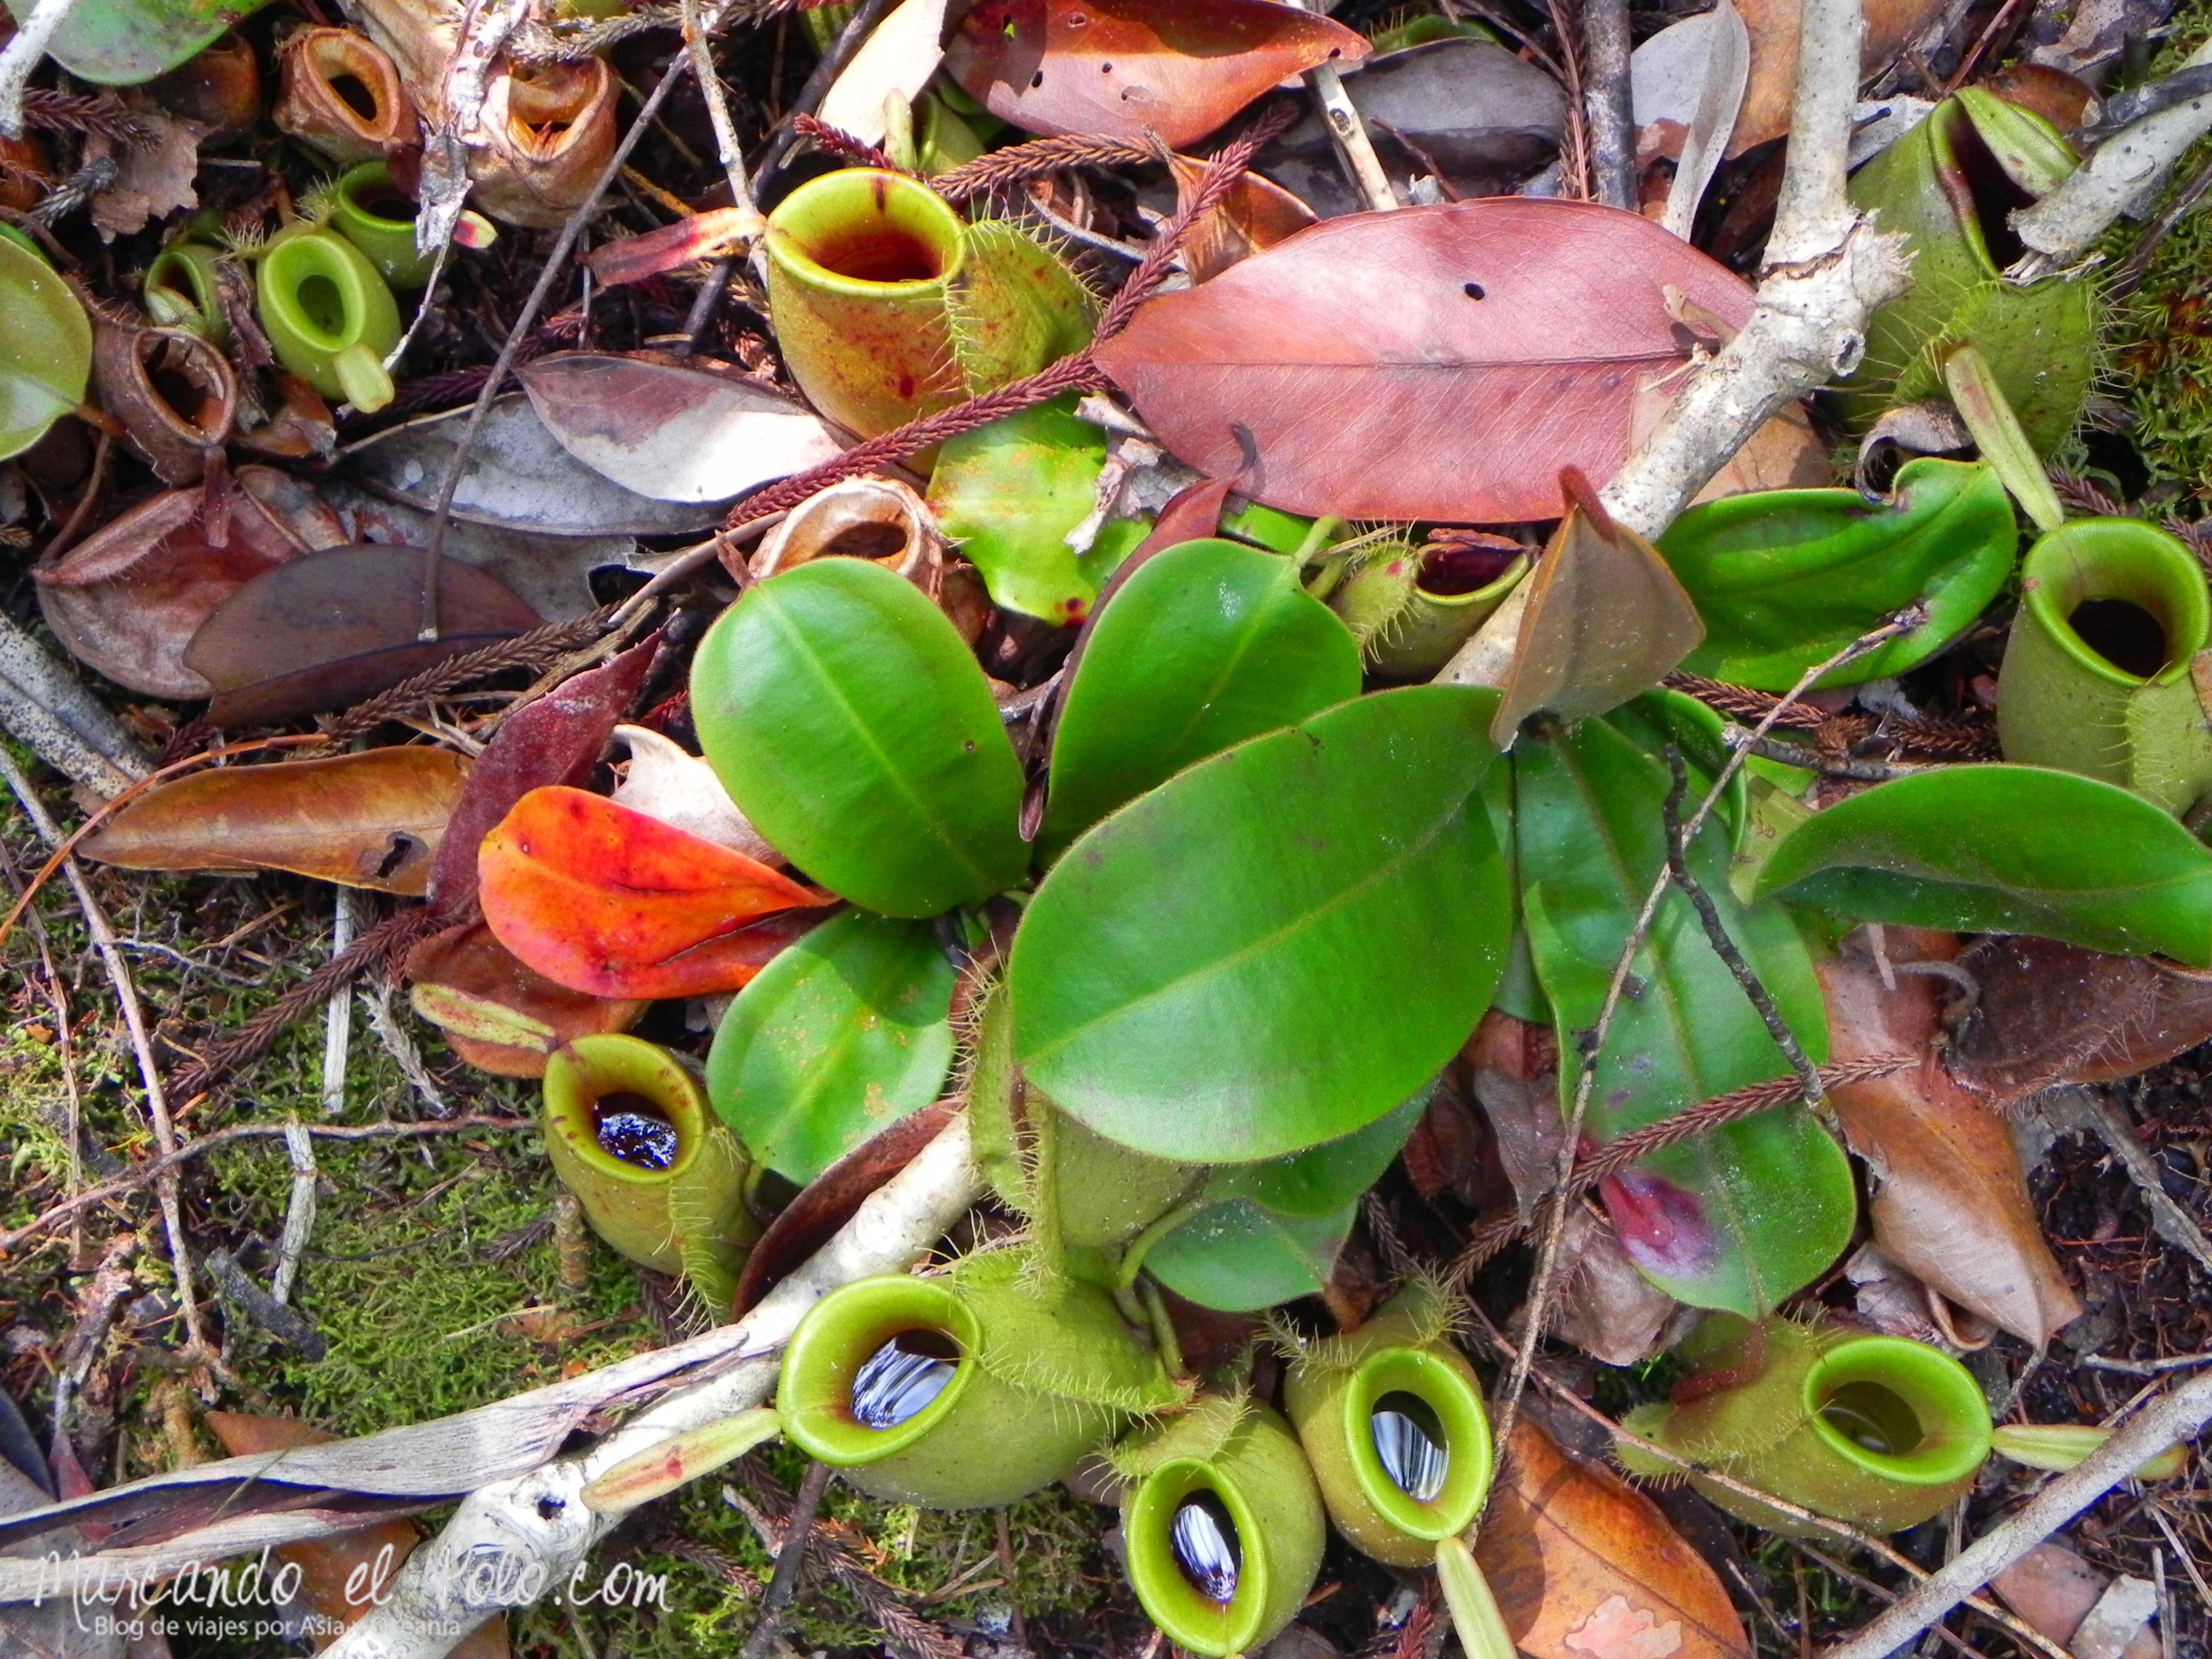 Itinerario viajar a Malasia: plantas carnívoras, Bako